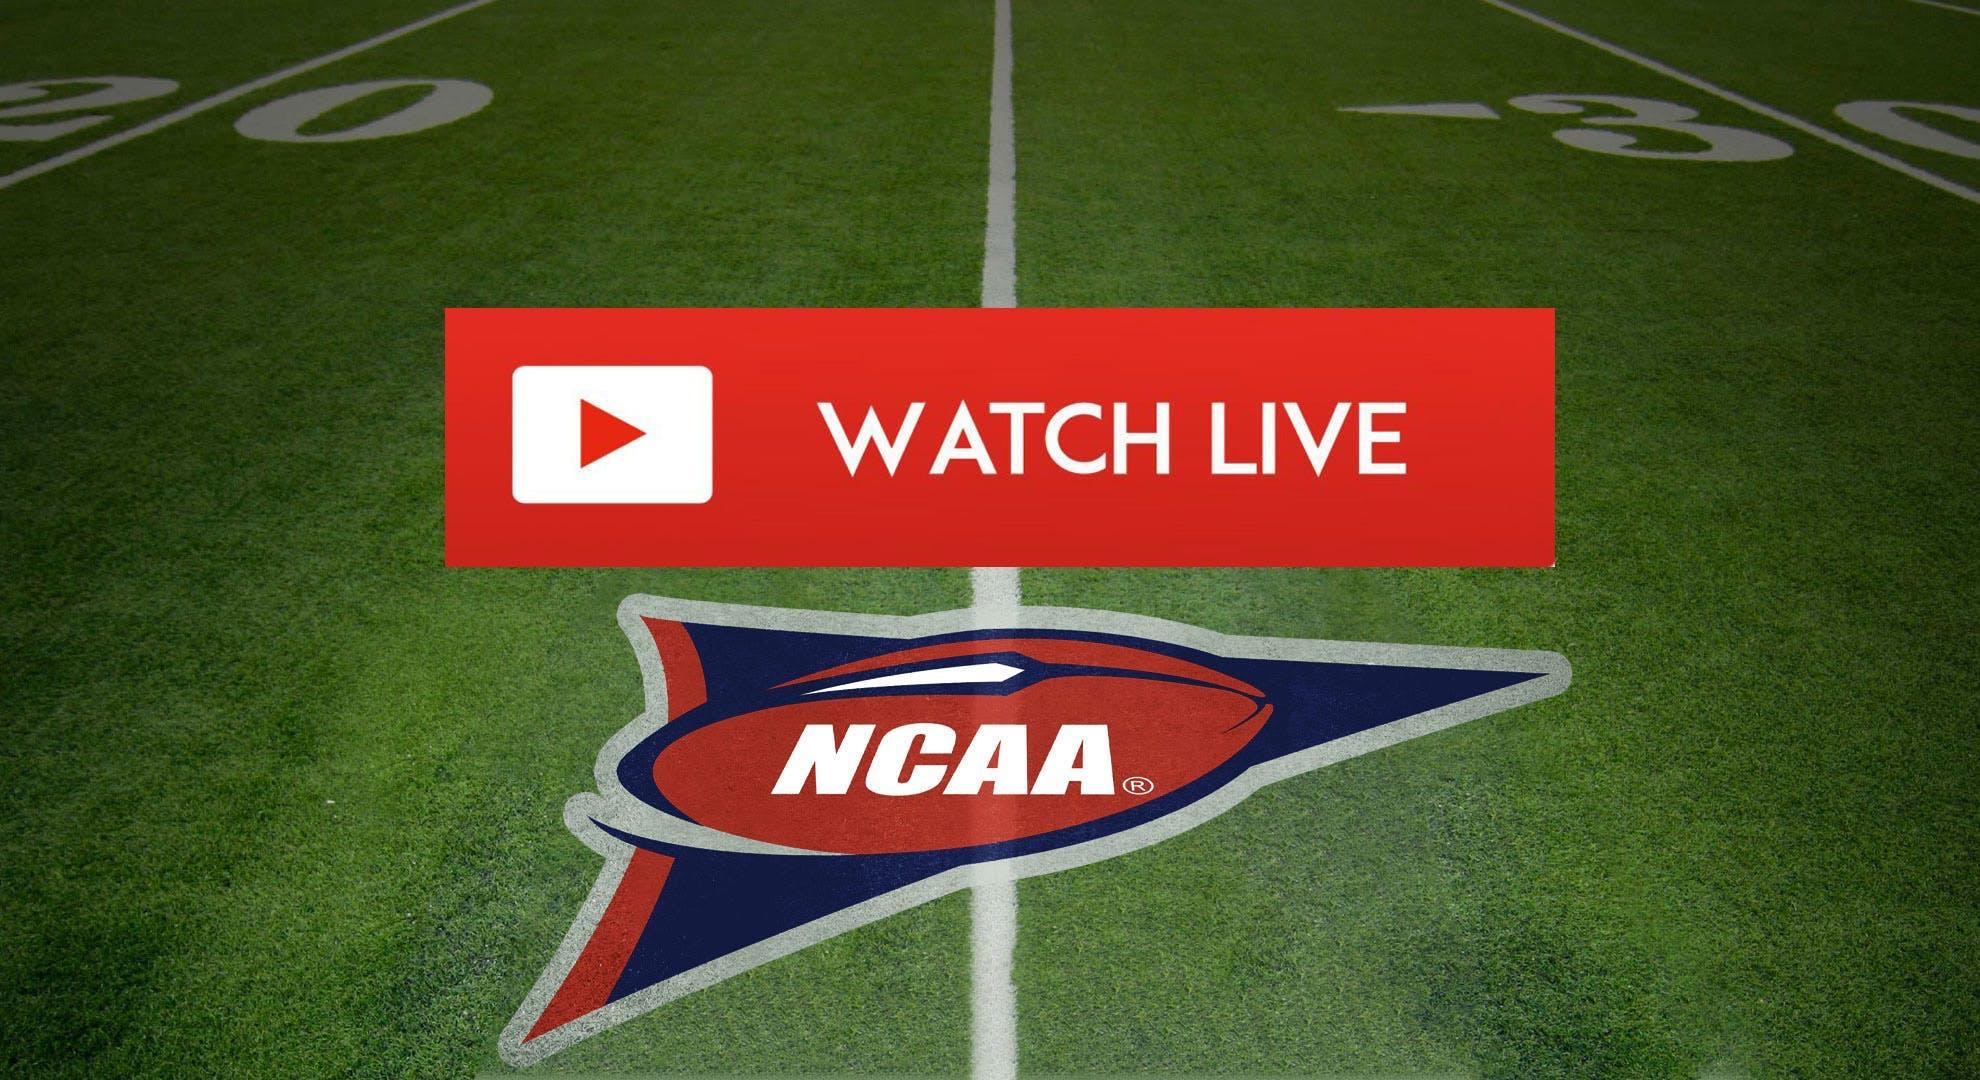 Marshall vs Louisiana Tech Live Streaming Reddit FREE Watch NCAA Football 2020 Week 7 GAME